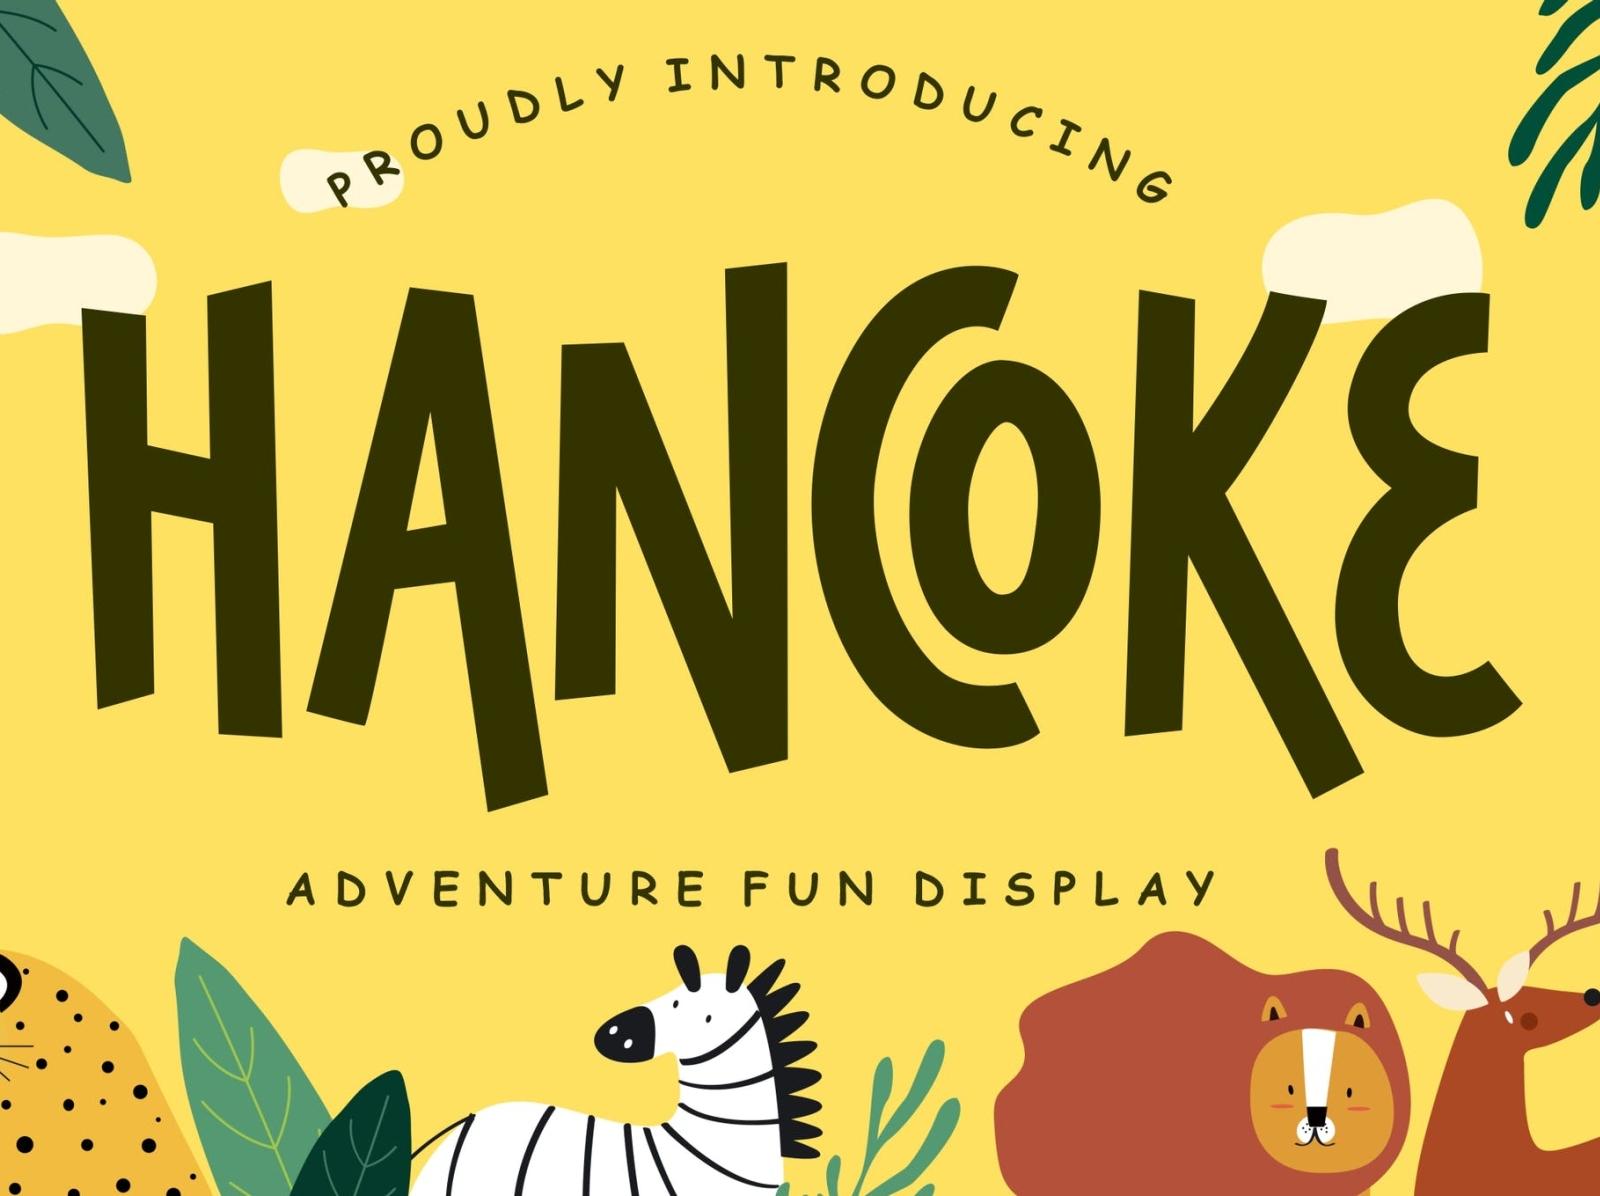 Hancoke Adventure Fun Display Font display font font display fun adventure ux vector ui logo app typography illustration graphic design design branding